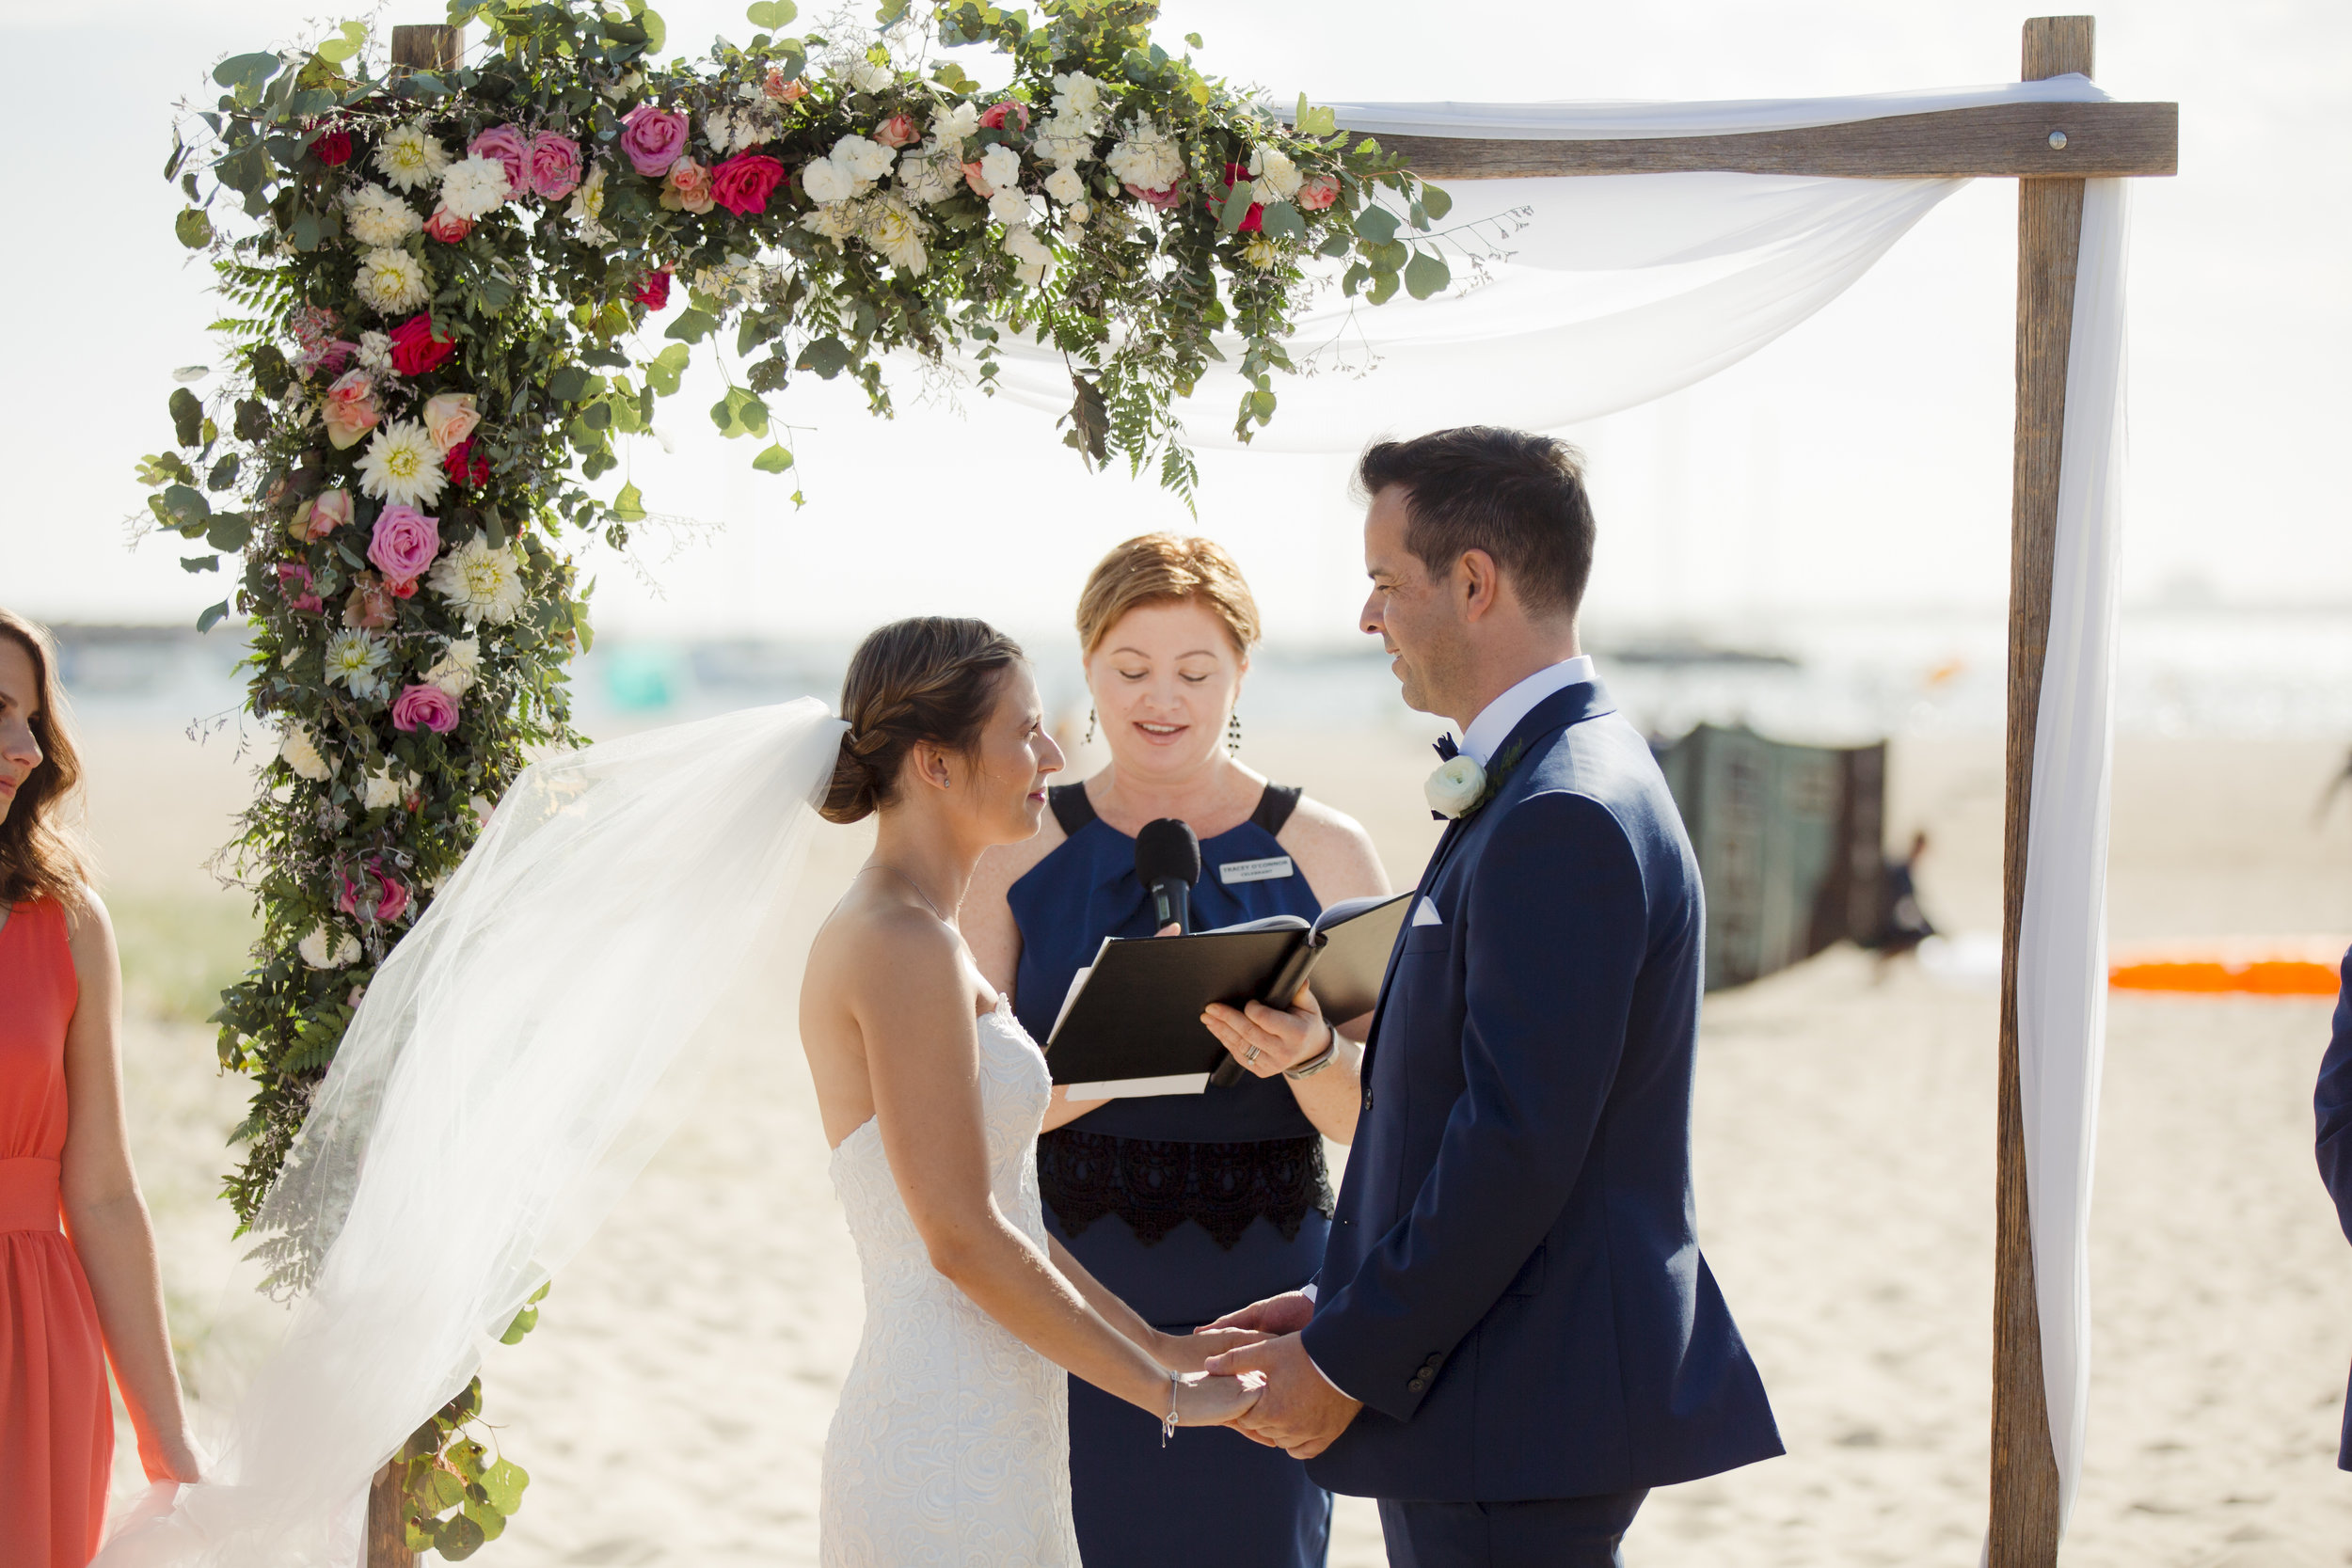 Emilie+Daniel+West+Beach+Pavilion+Wedding+Ceremony_Epic Photography.jpg